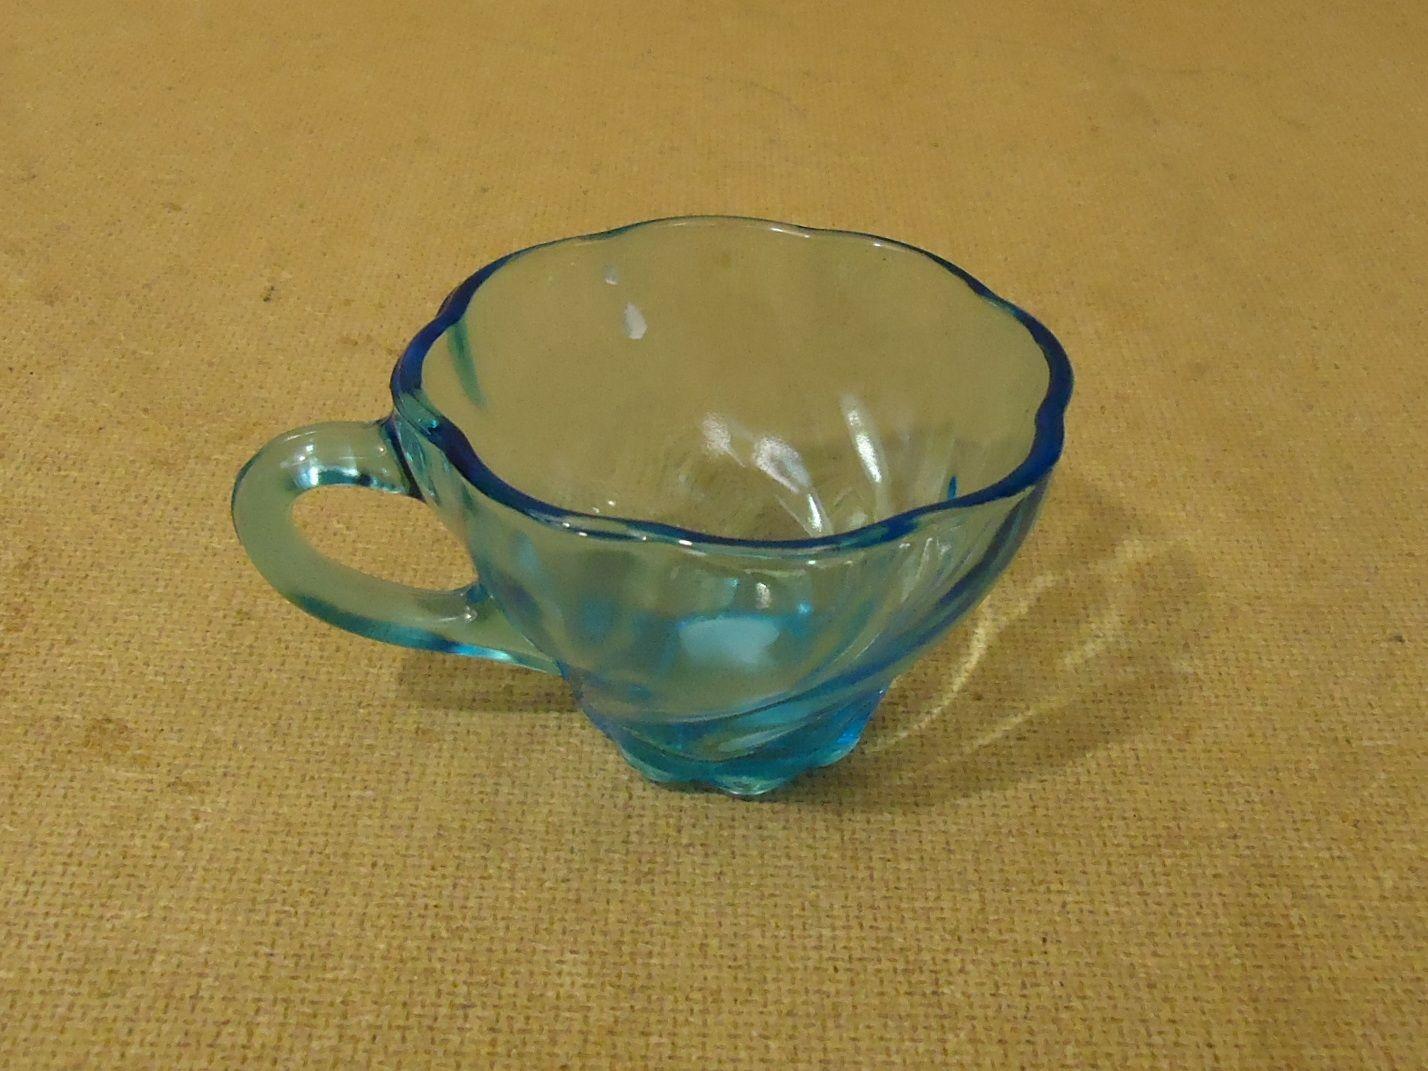 lm7410 111712-158n Designer Vintage Decorative Tea Cup 3 1/2in Diameter x 2 1/4in H Blues Mid Century Glass